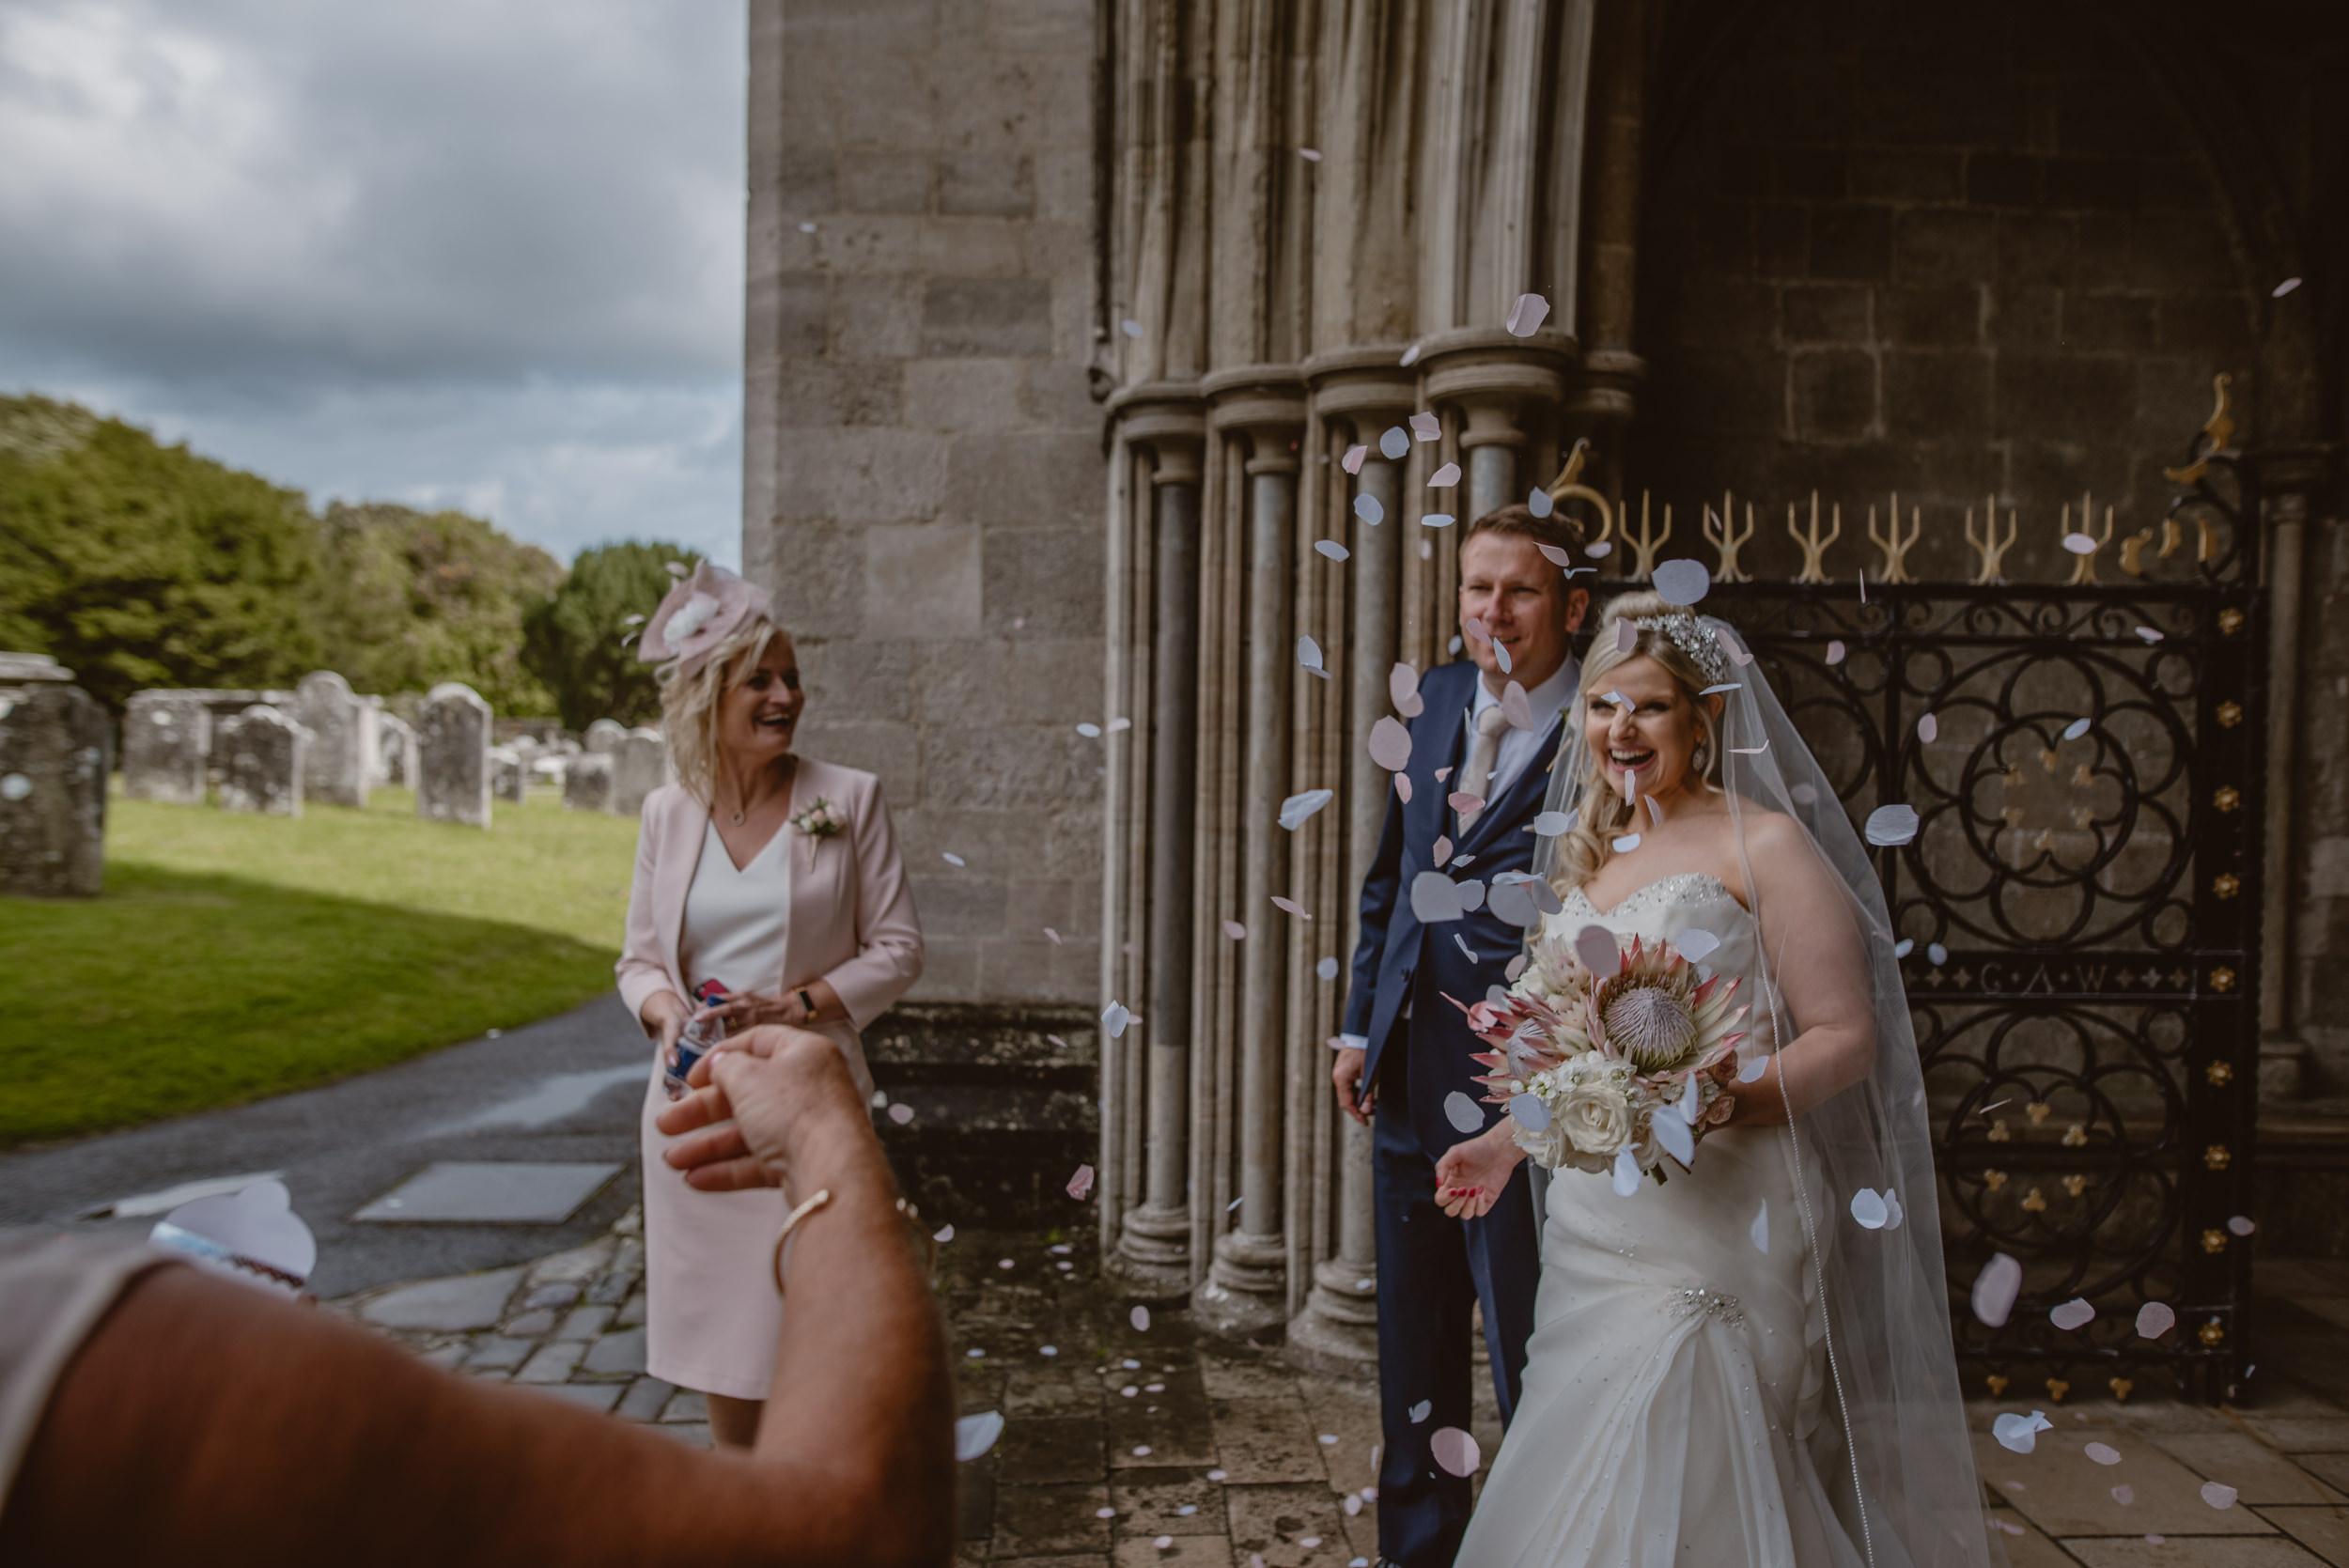 Trisha-and-Roger-wedding-The-Priory-Church-and-Chewton-Glen-Hotel-Christchurch-Manu-Mendoza-Wedding-Photography-230.jpg